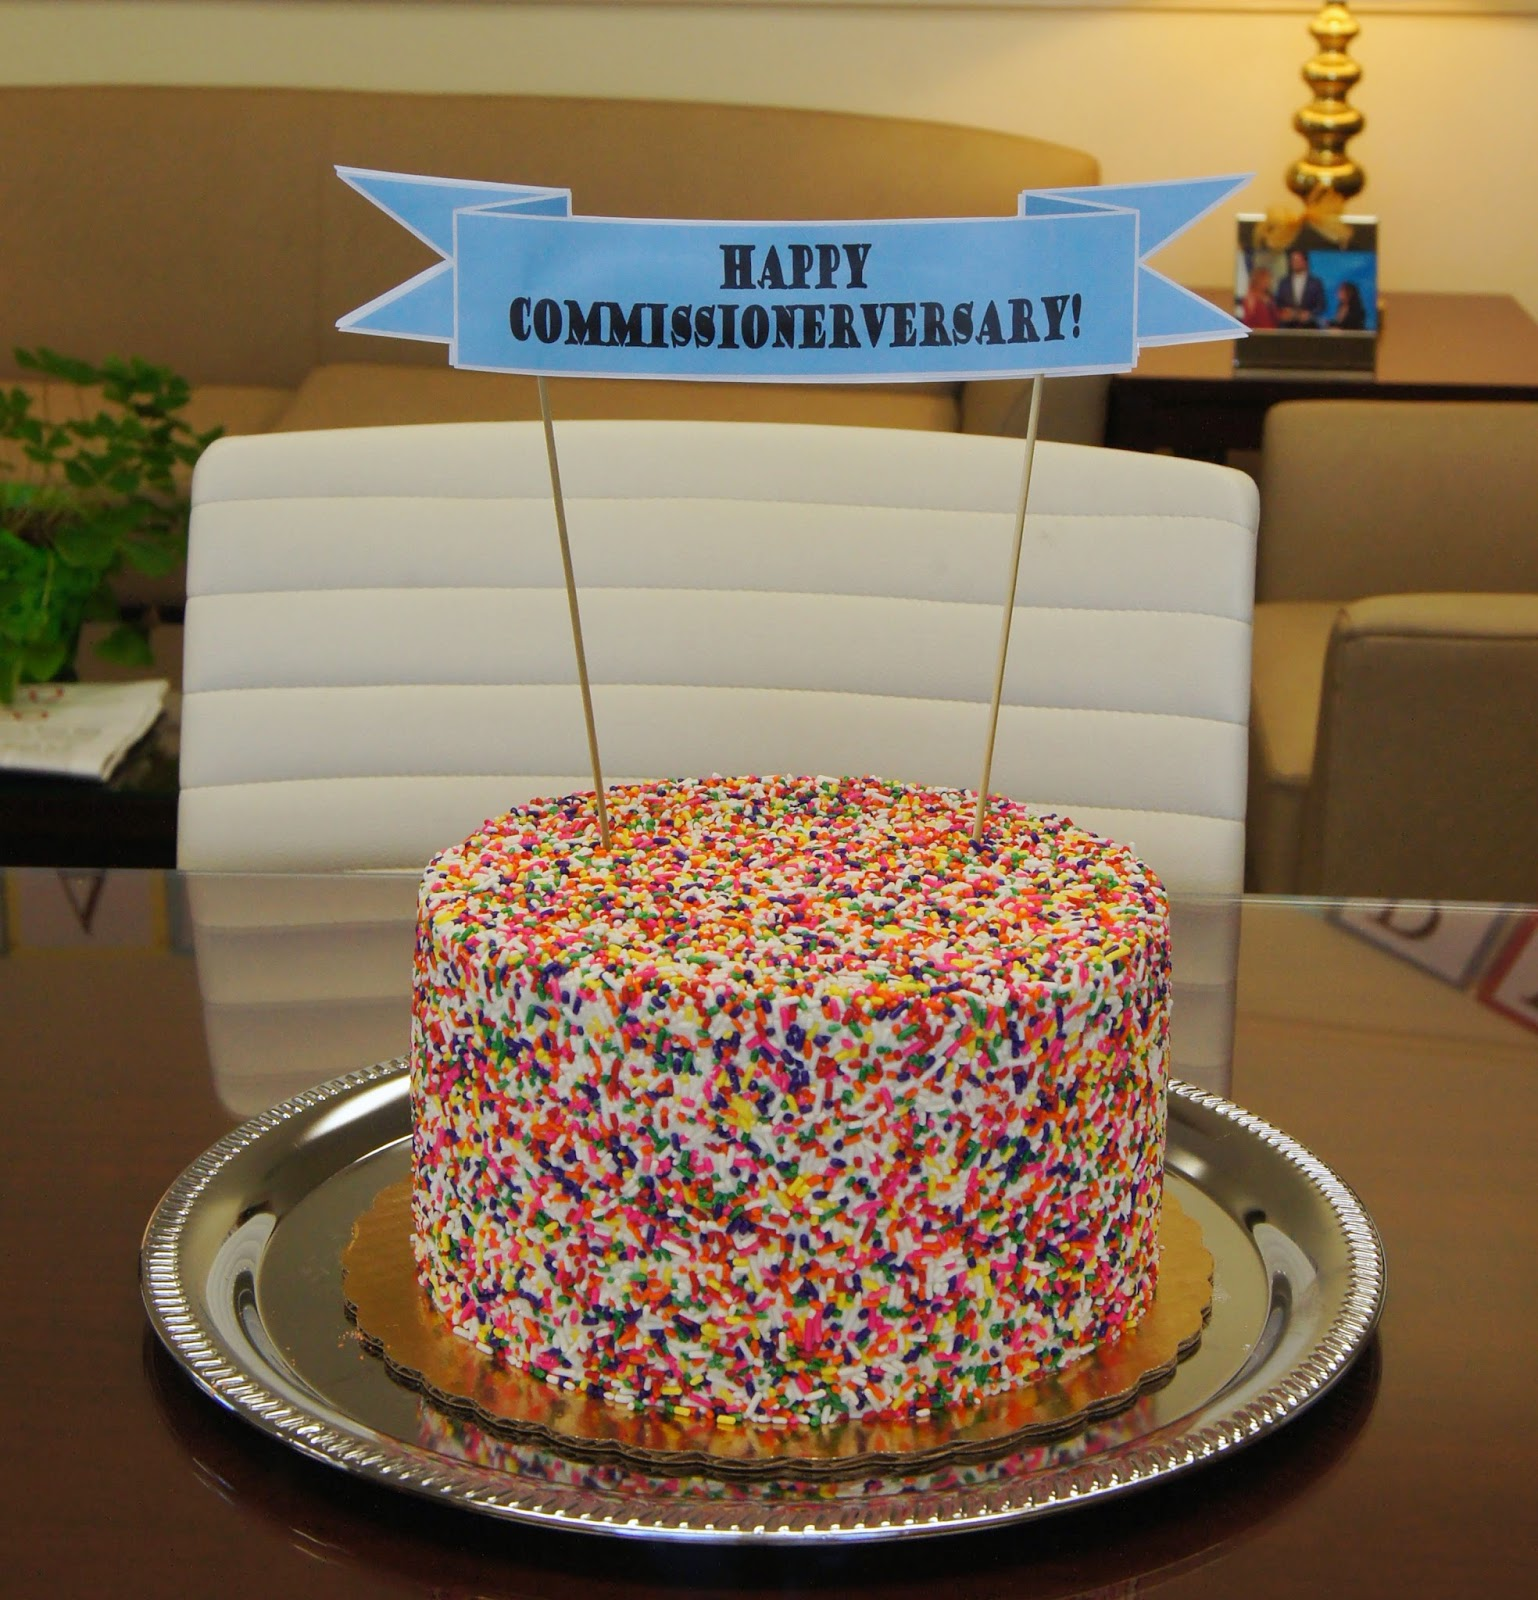 Baked Sunday Mornings Ultimate Birthday Cake